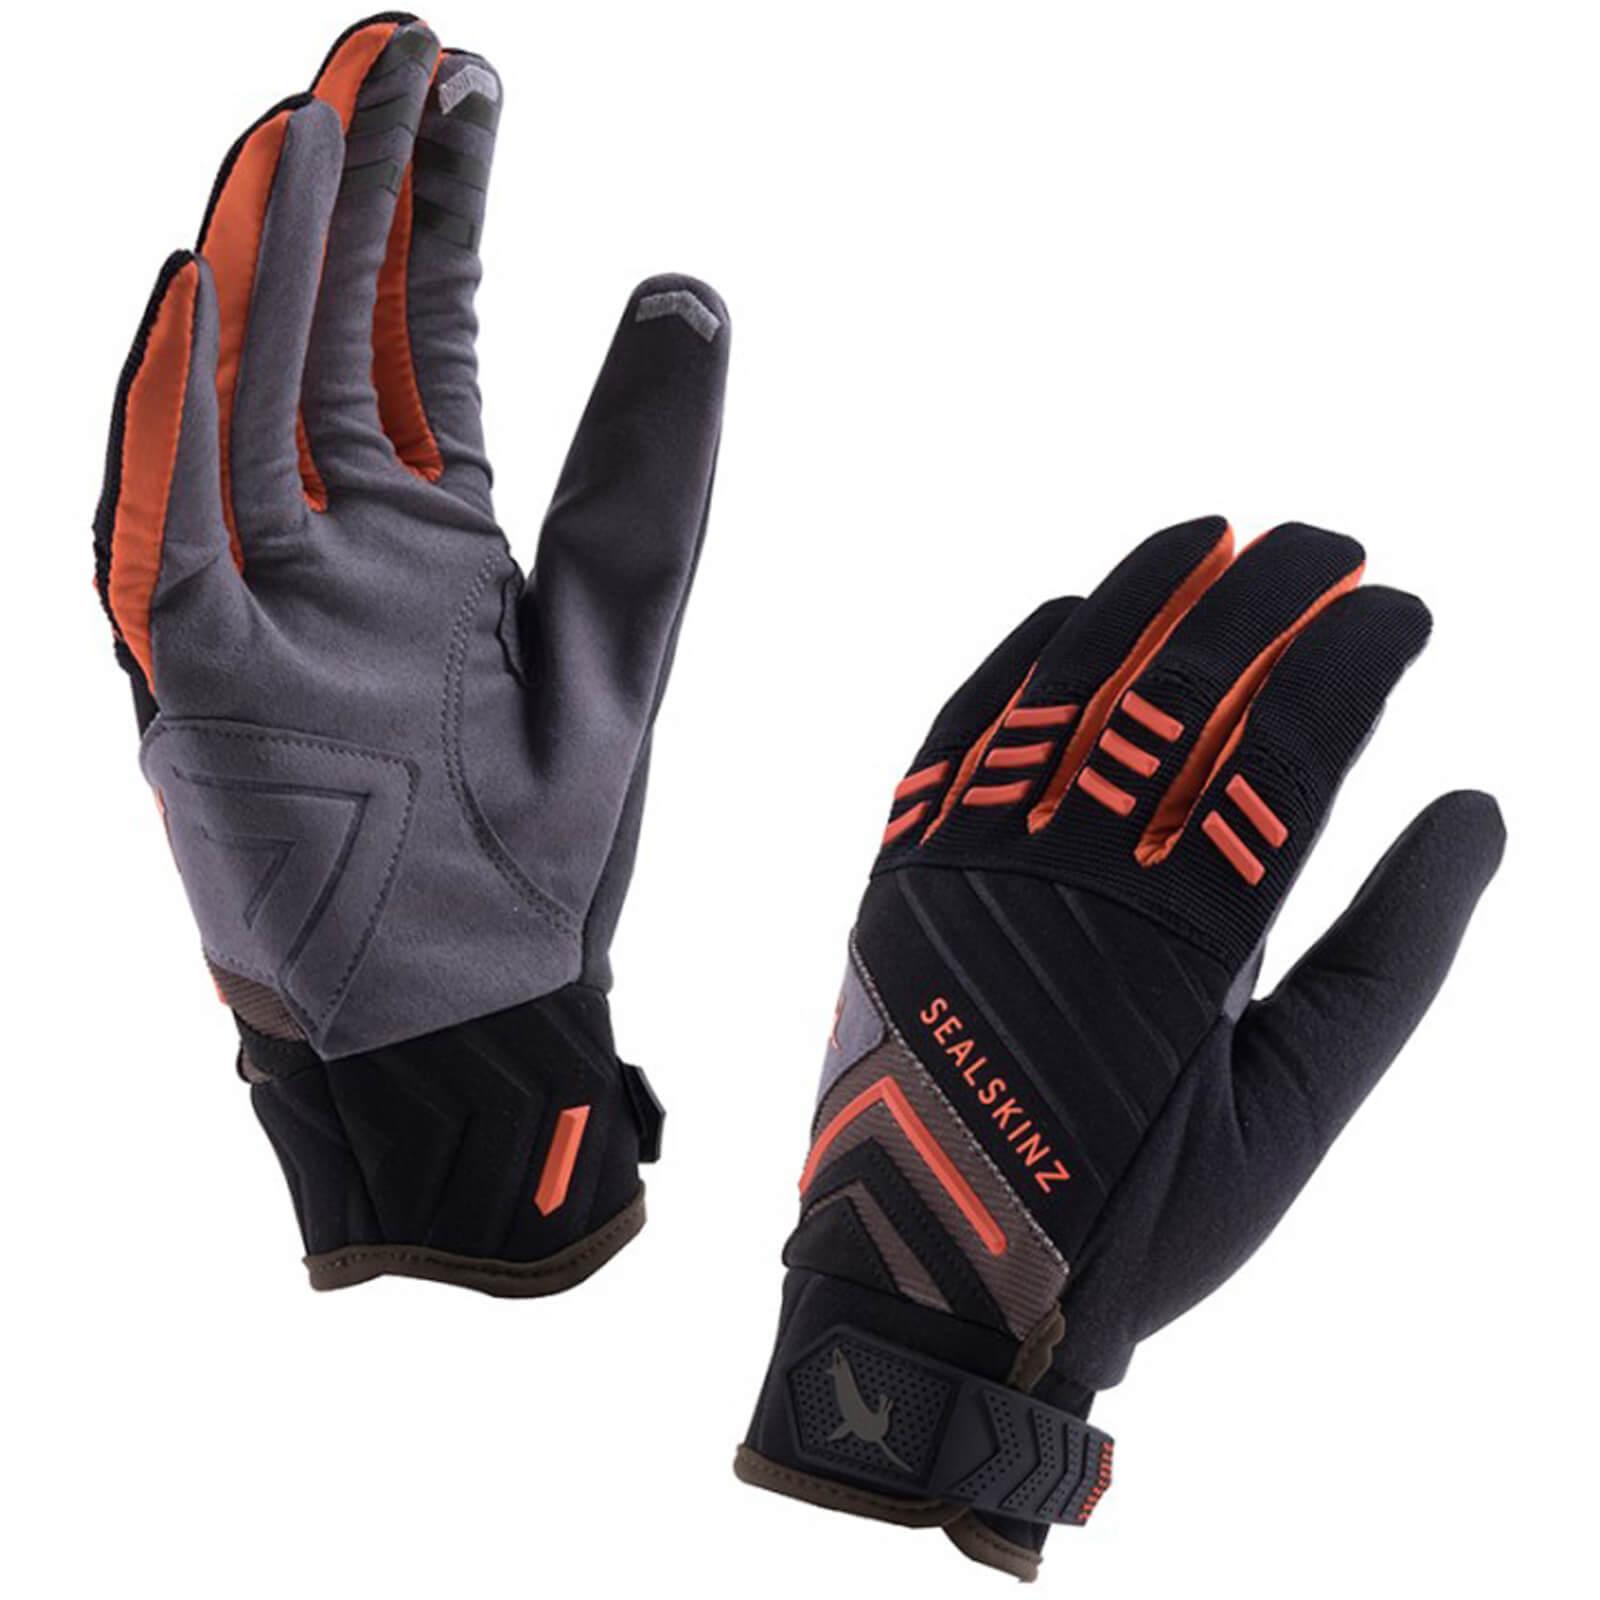 Sealskinz Dragon Eye Trail Gloves - Black/Green/Orange | Handsker